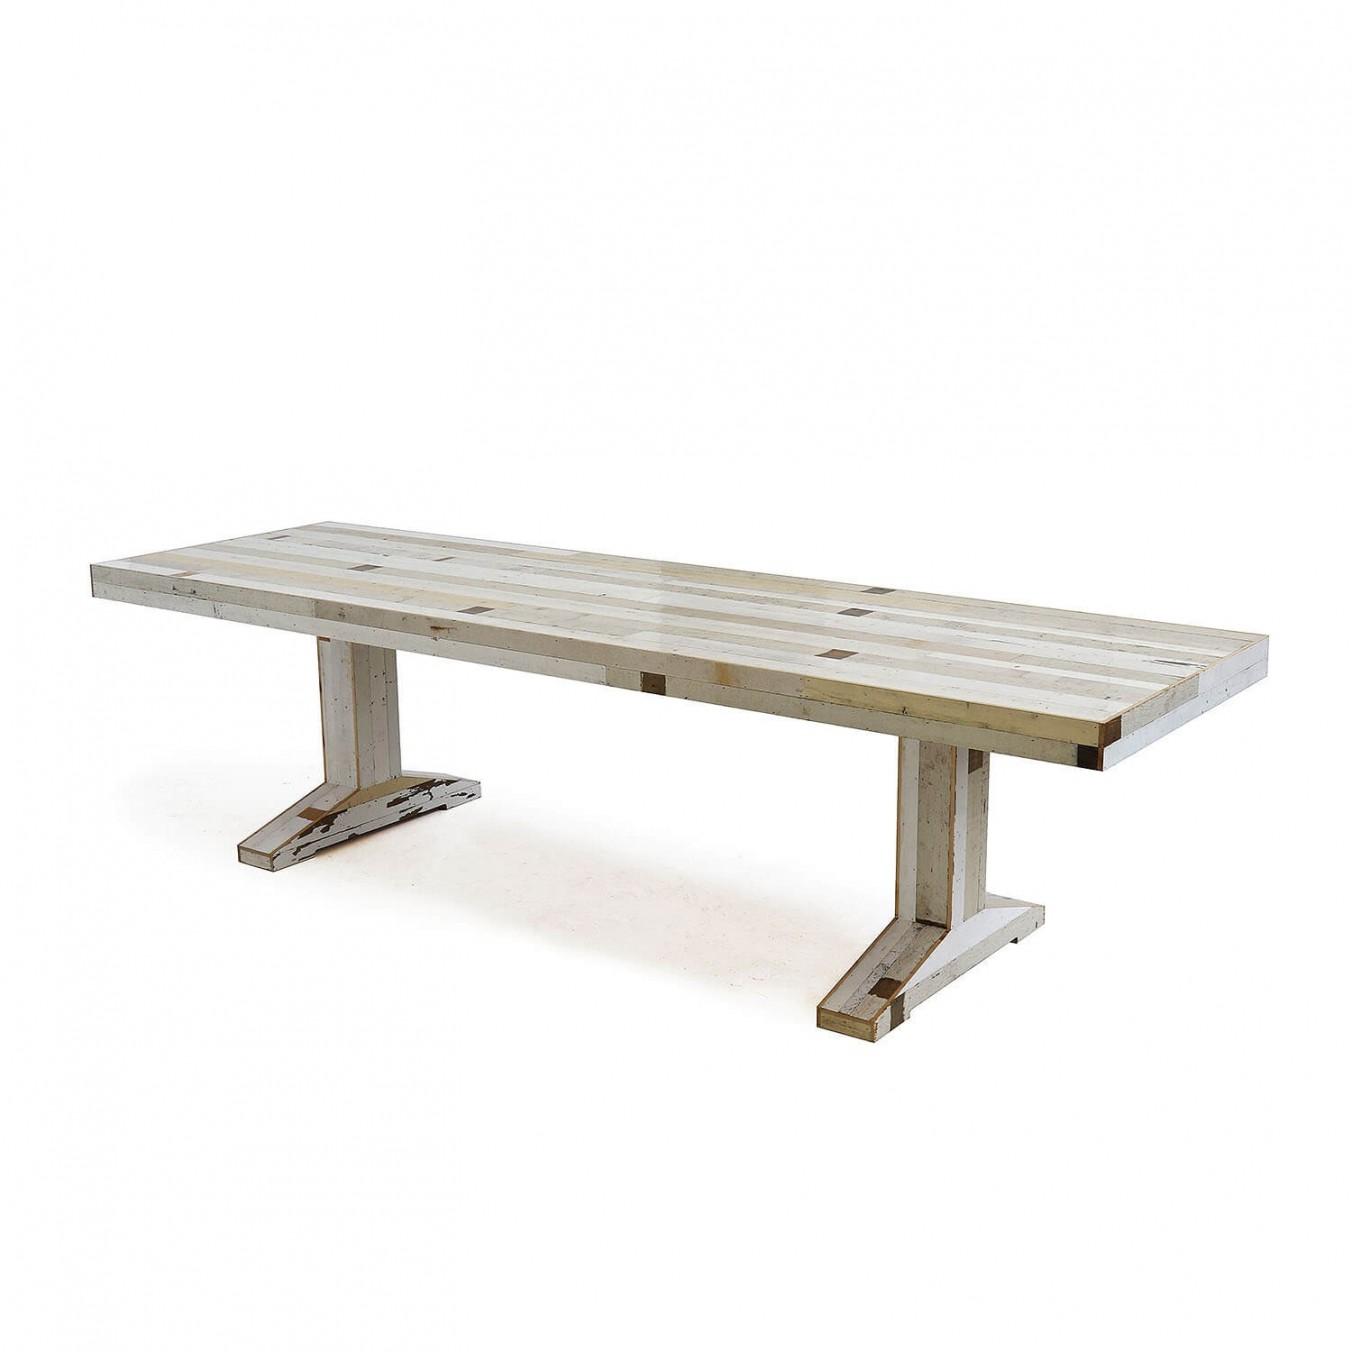 Canteen Table in Scrapwood